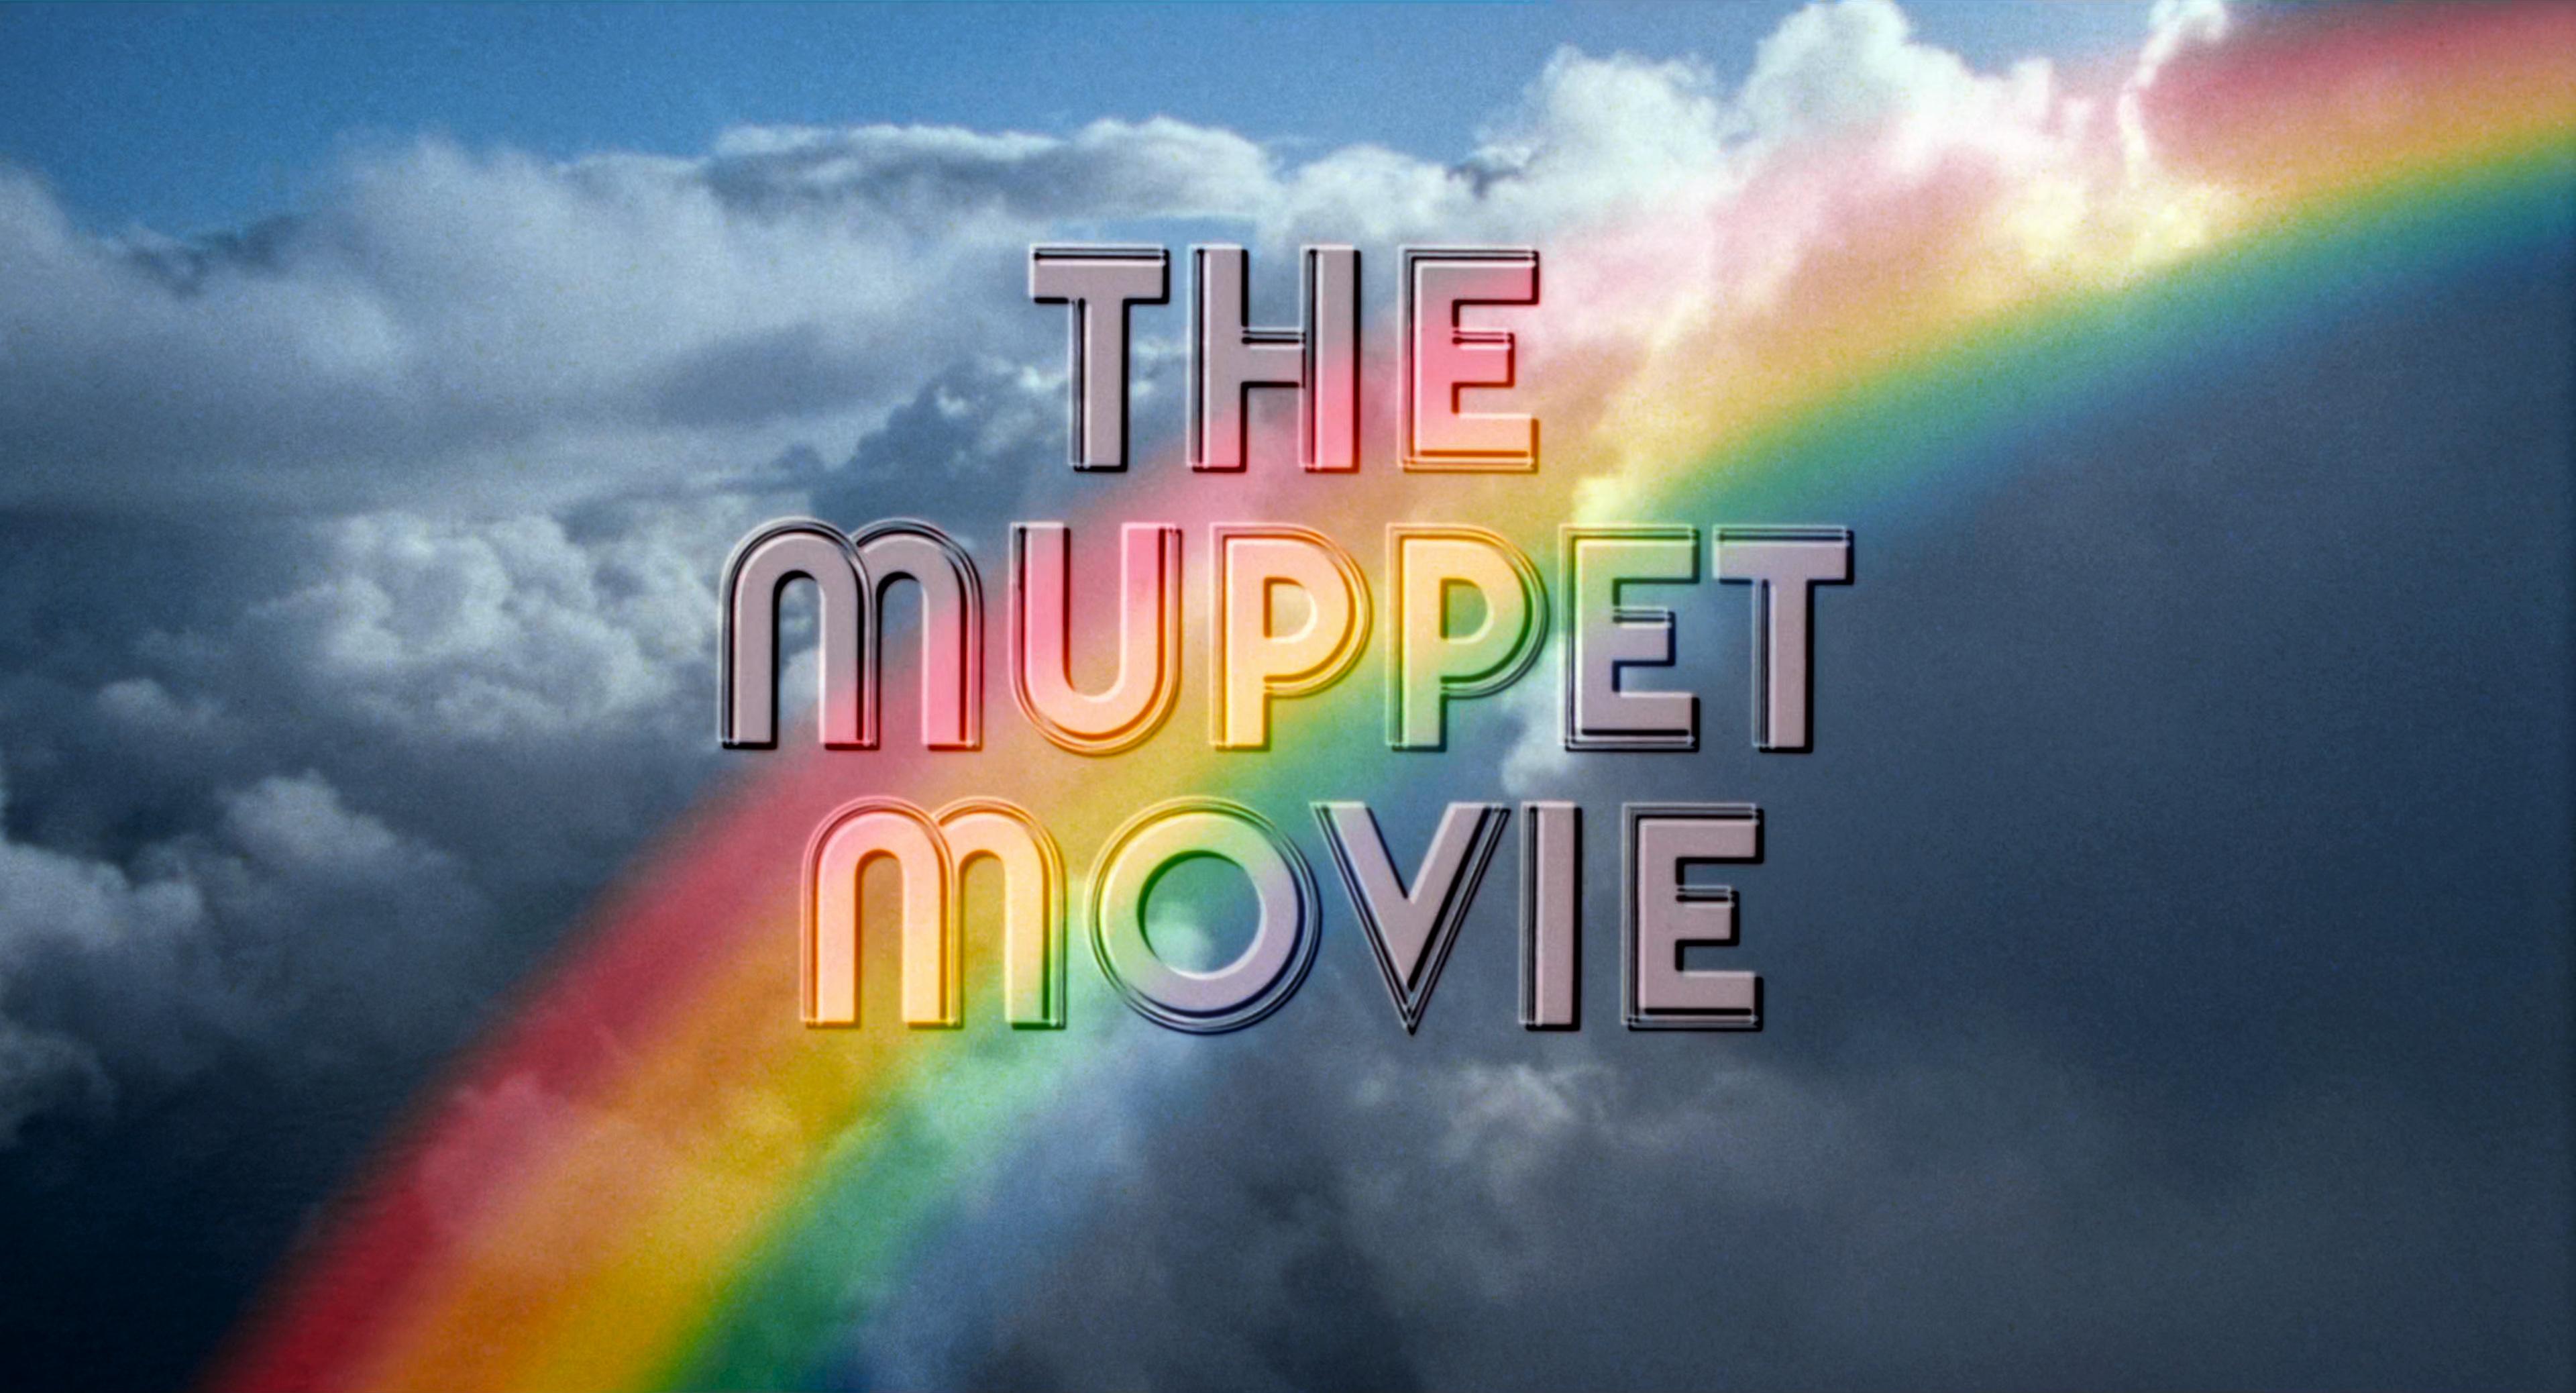 The Muppet Movie   Muppet Wiki   FANDOM powered by Wikia